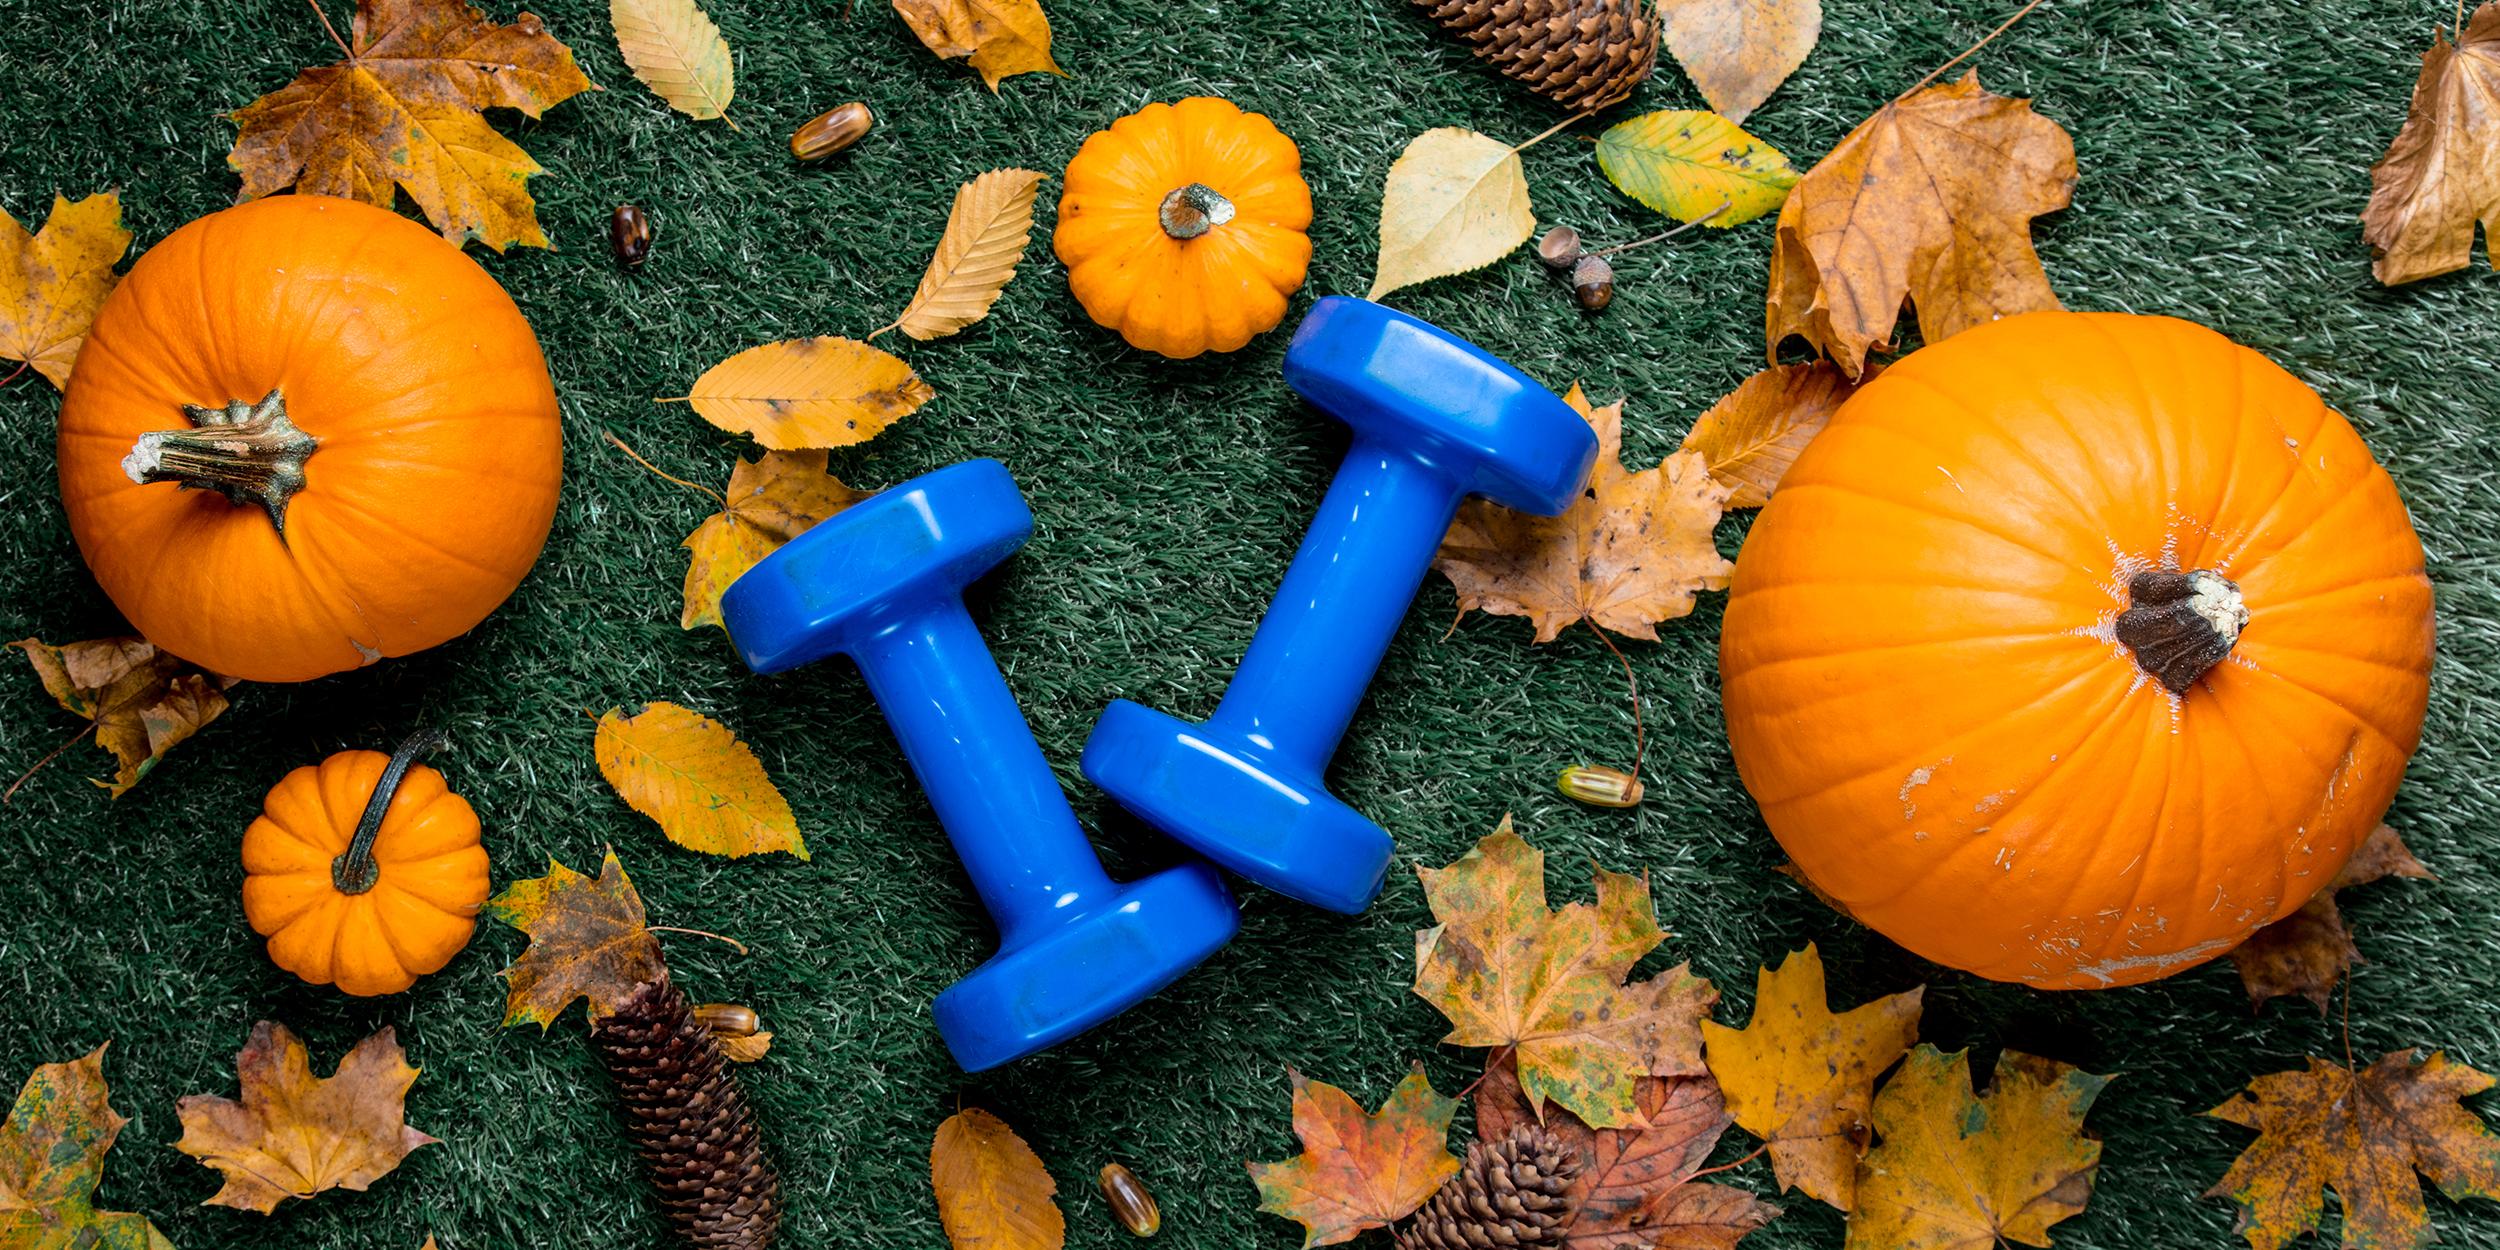 5 Fun Pumpkin Exercises to Do This Halloween